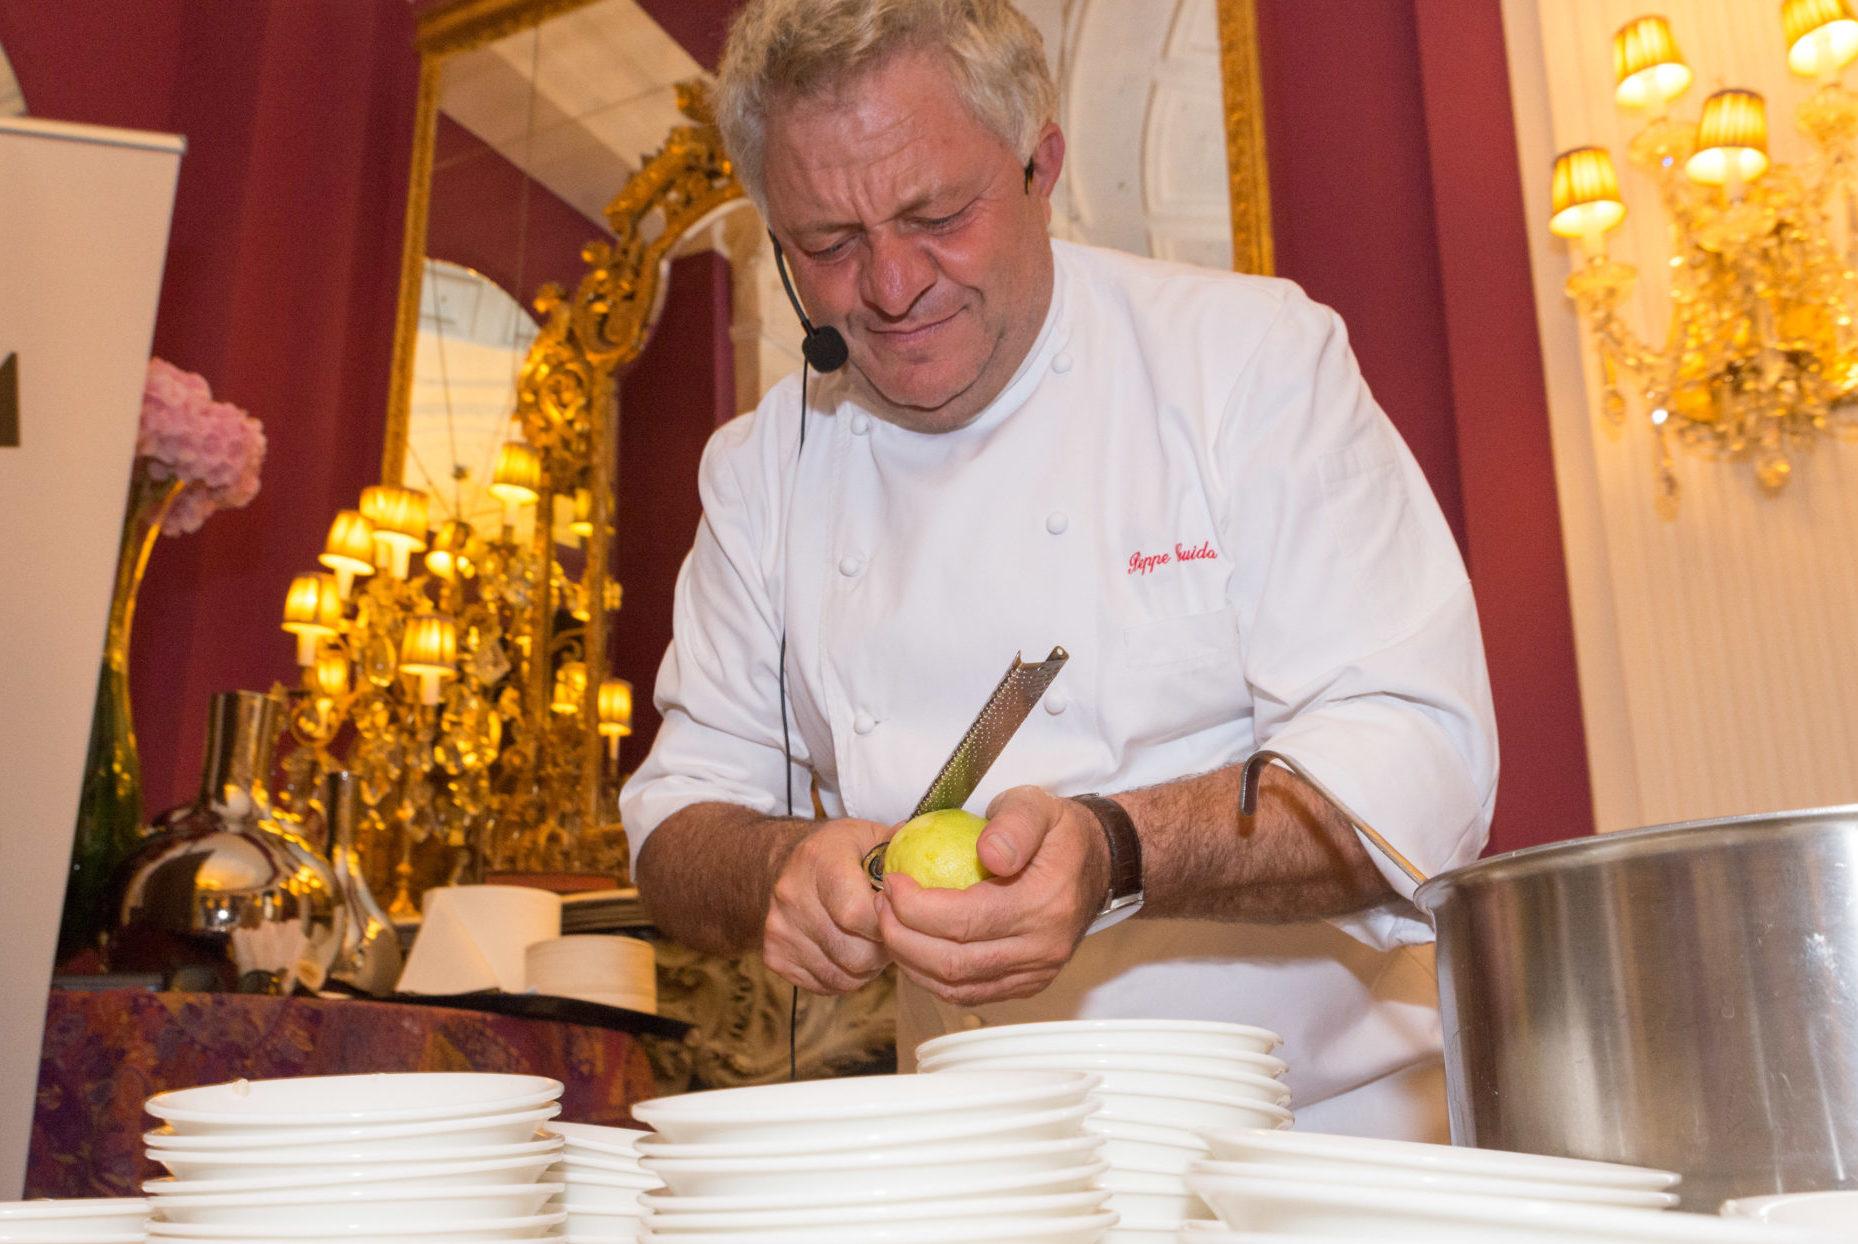 Chef Peppe Guida